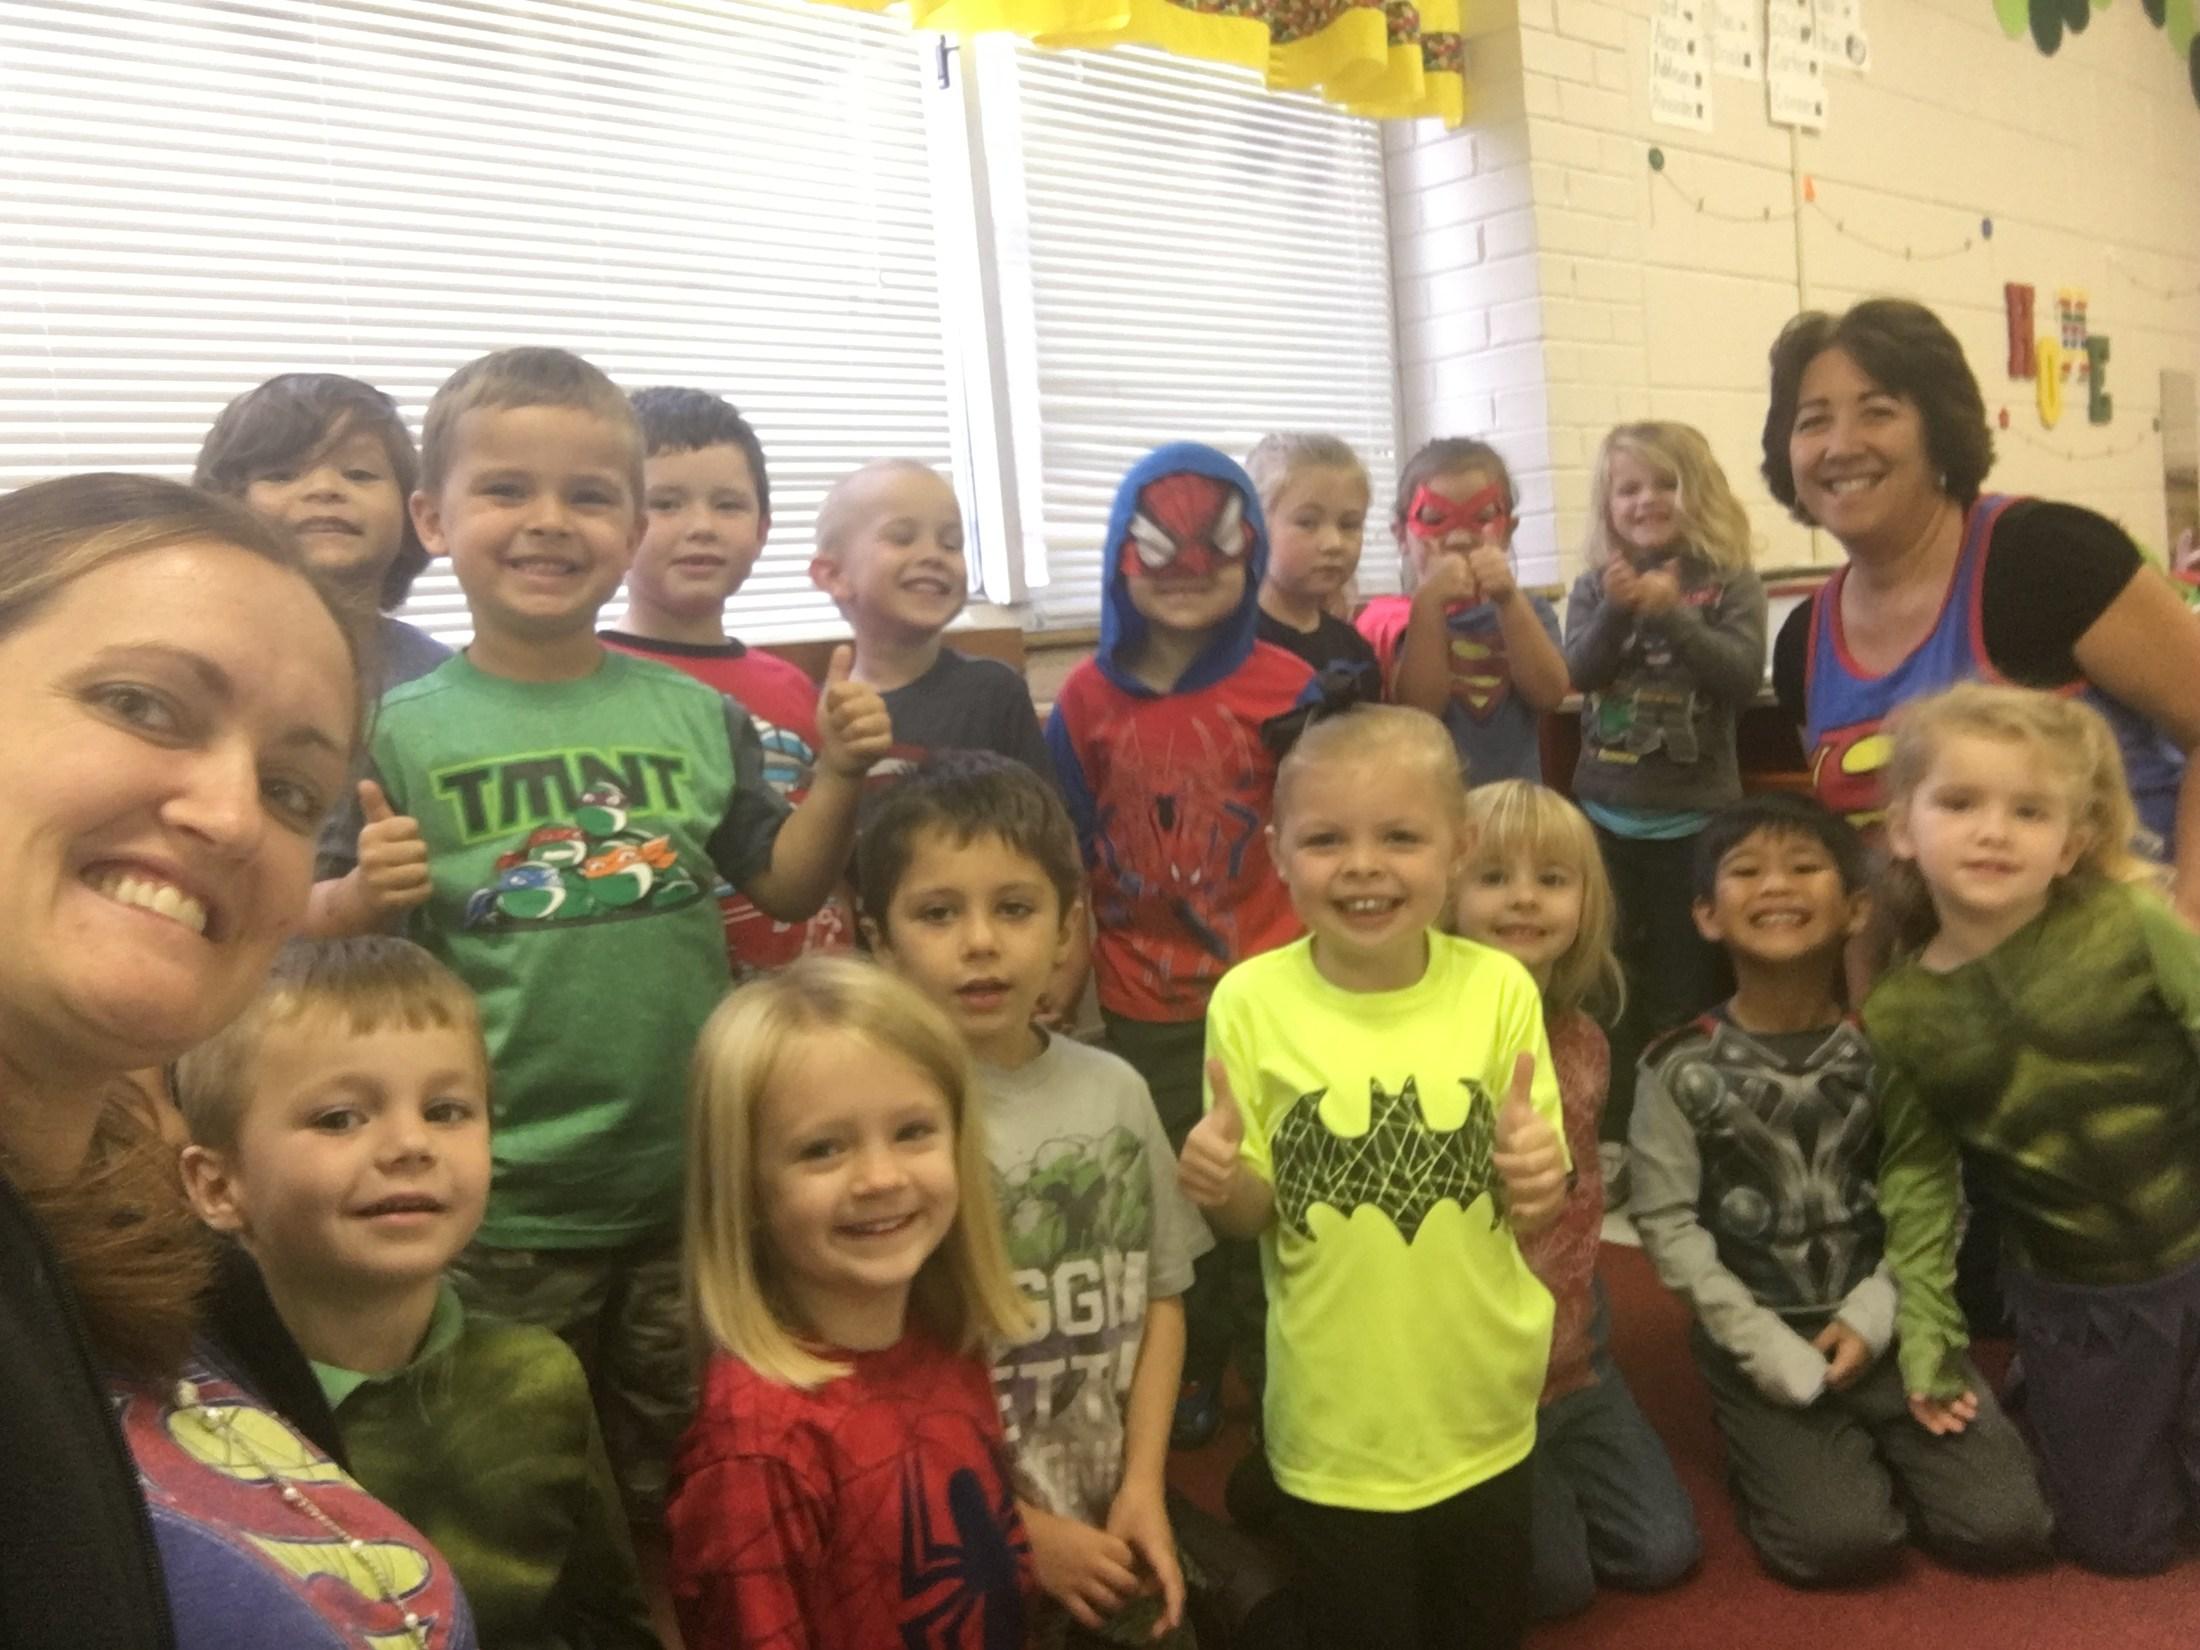 superhero group picture